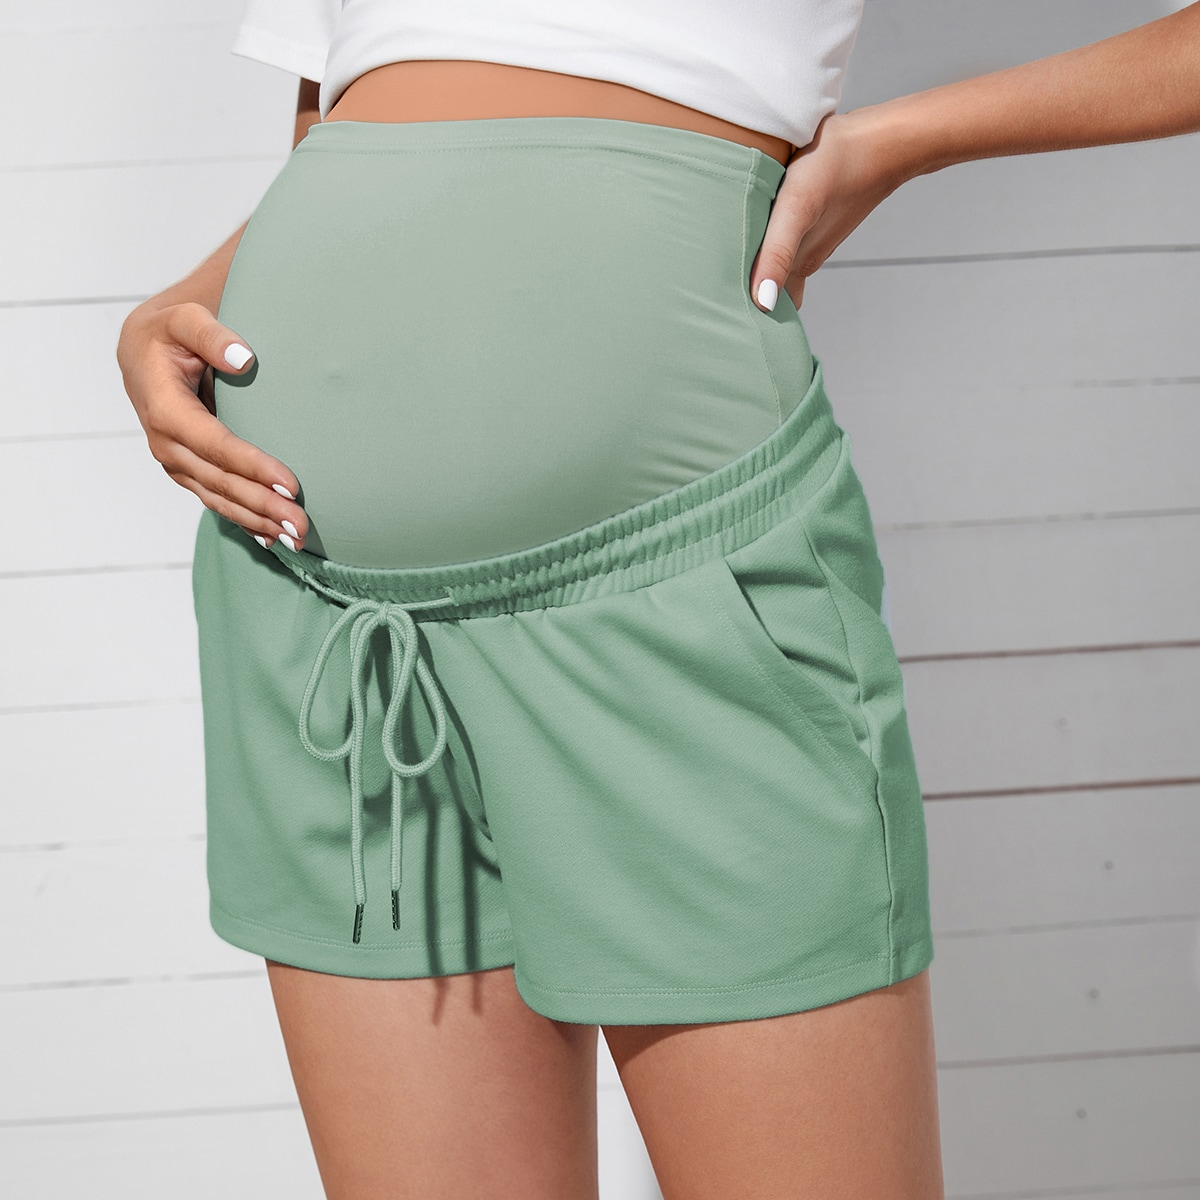 Maternity Drawstring Waist Shorts